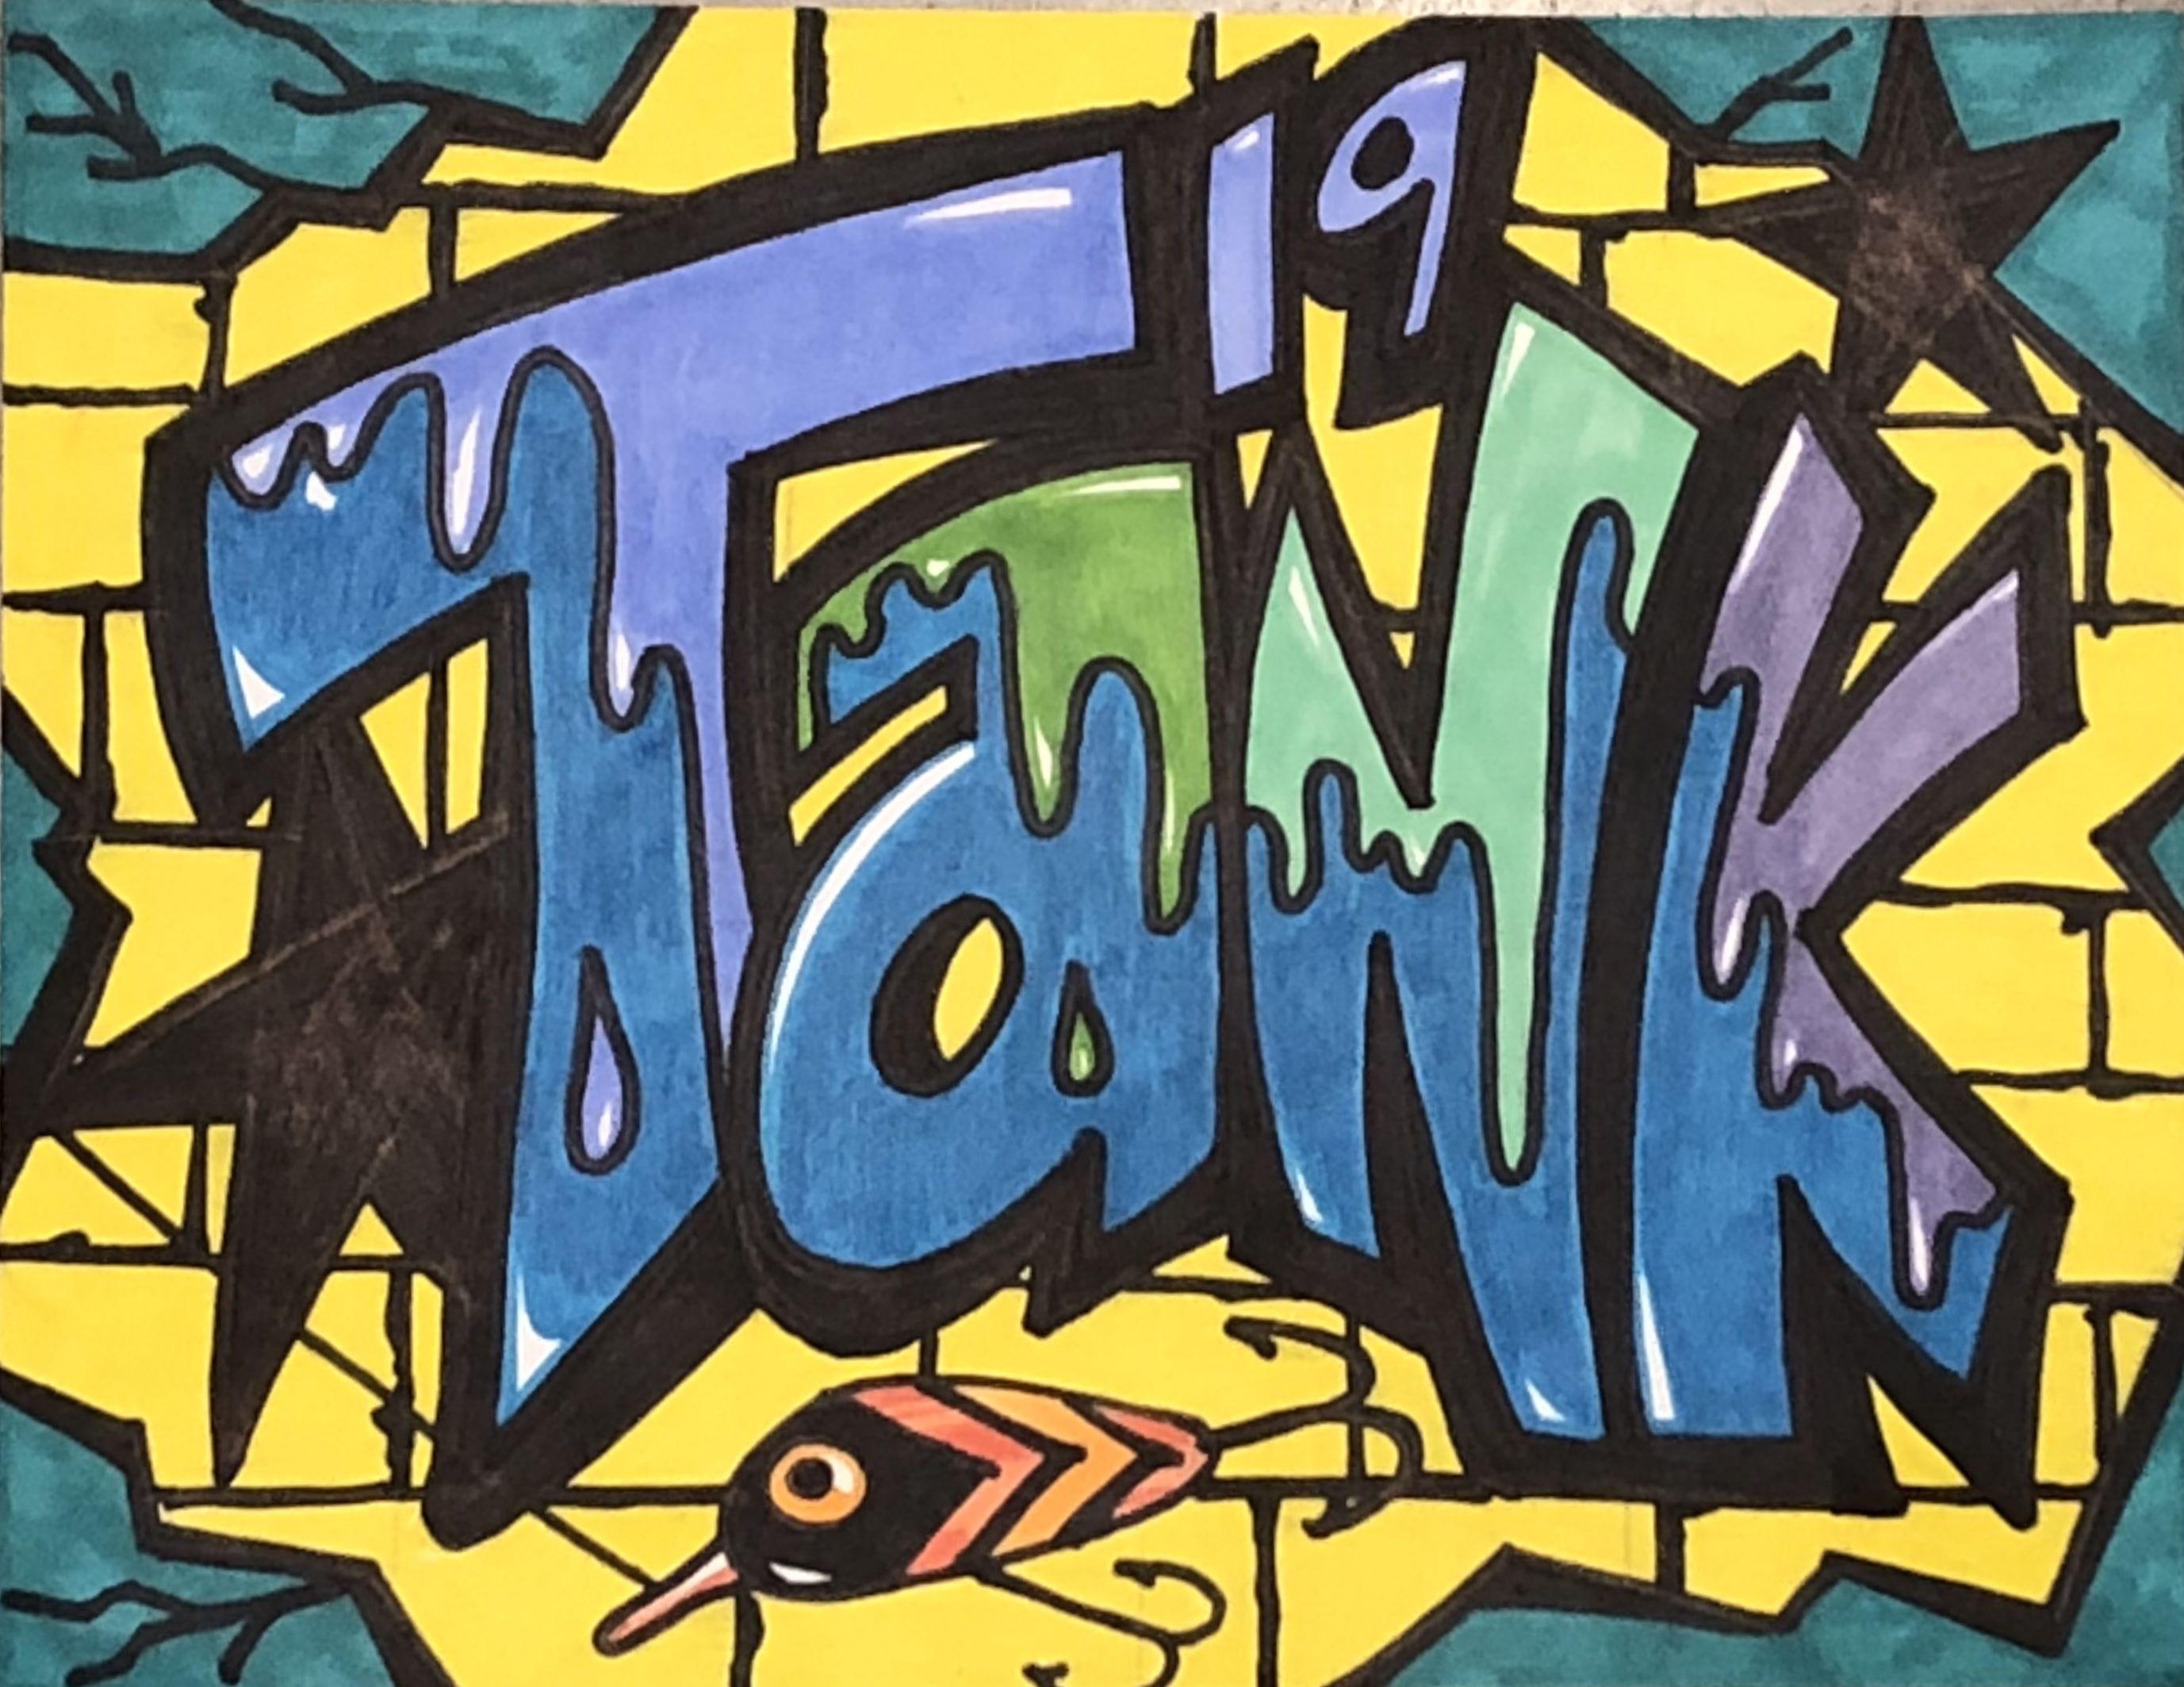 Graffiti name tank art lesson at corsicana middle school in corsicana texas